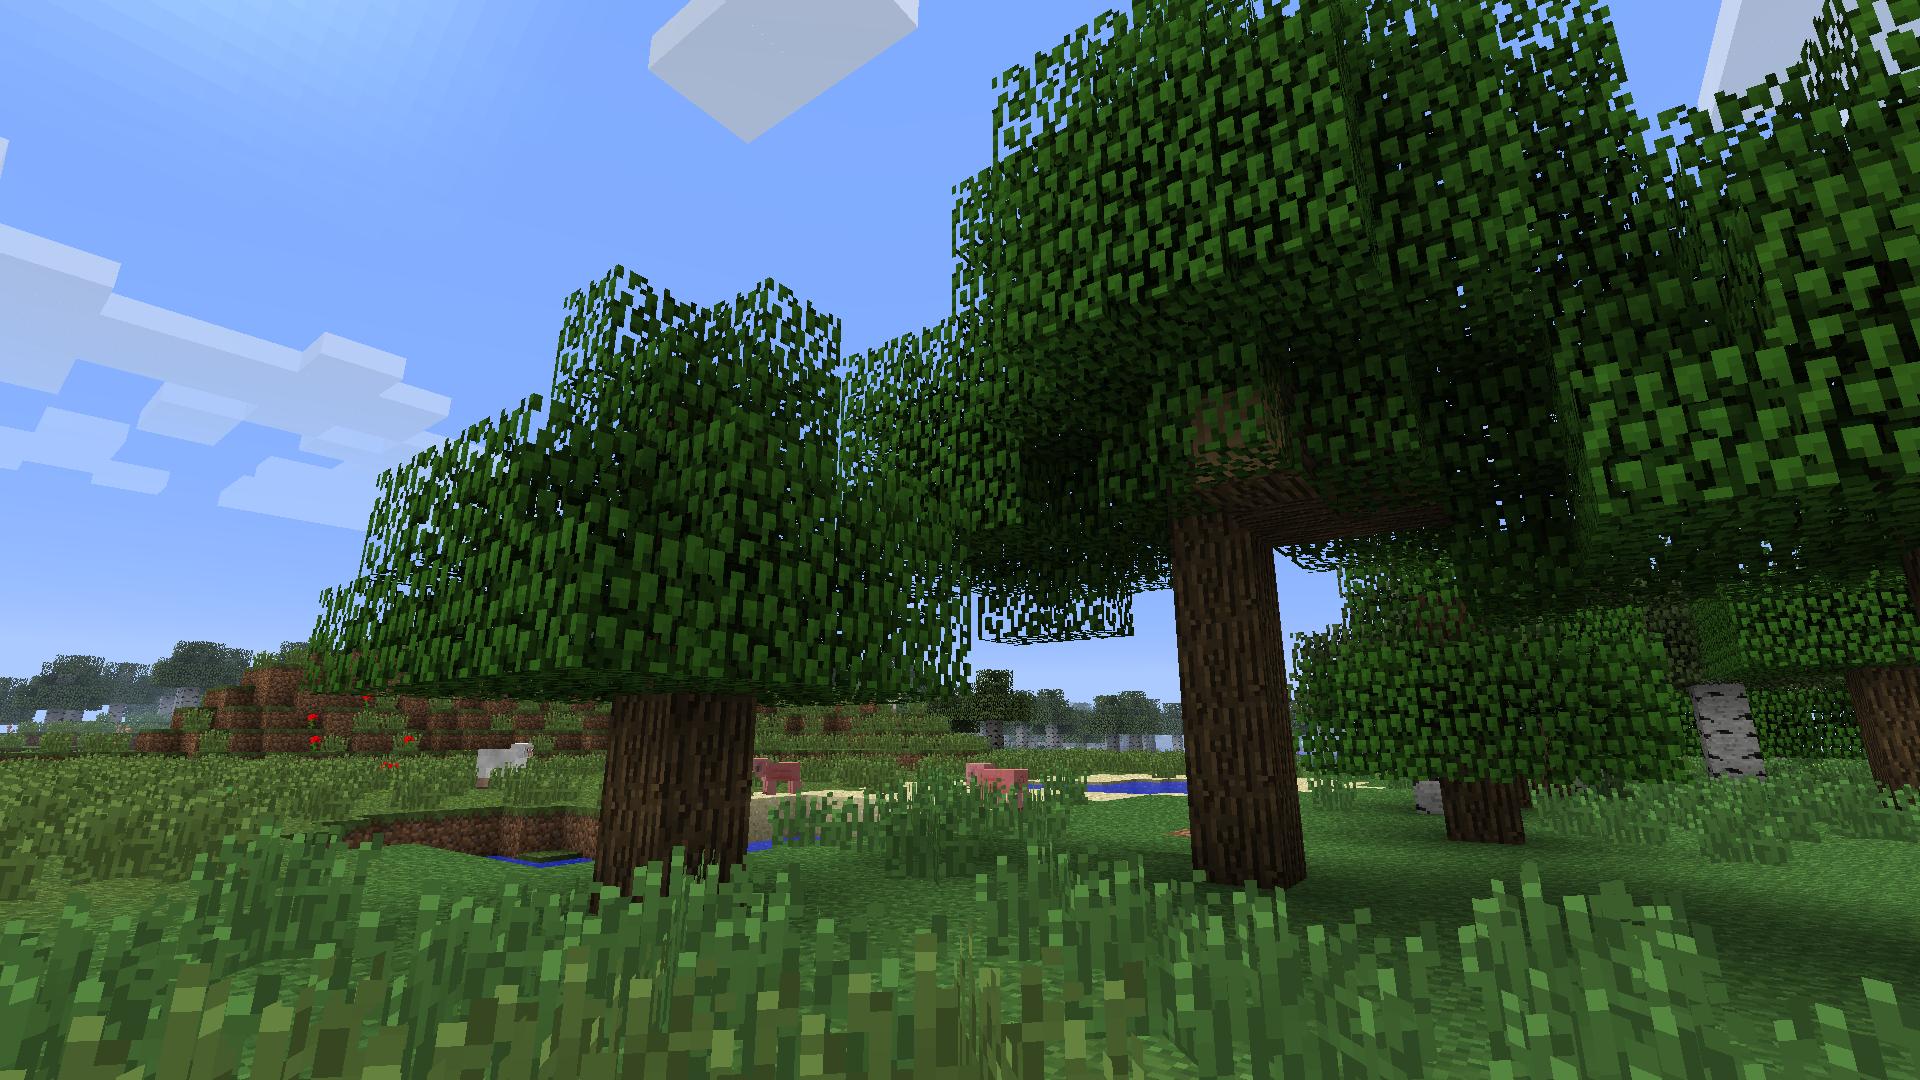 Tree/Gallery  Minecraft Wiki  Fandom